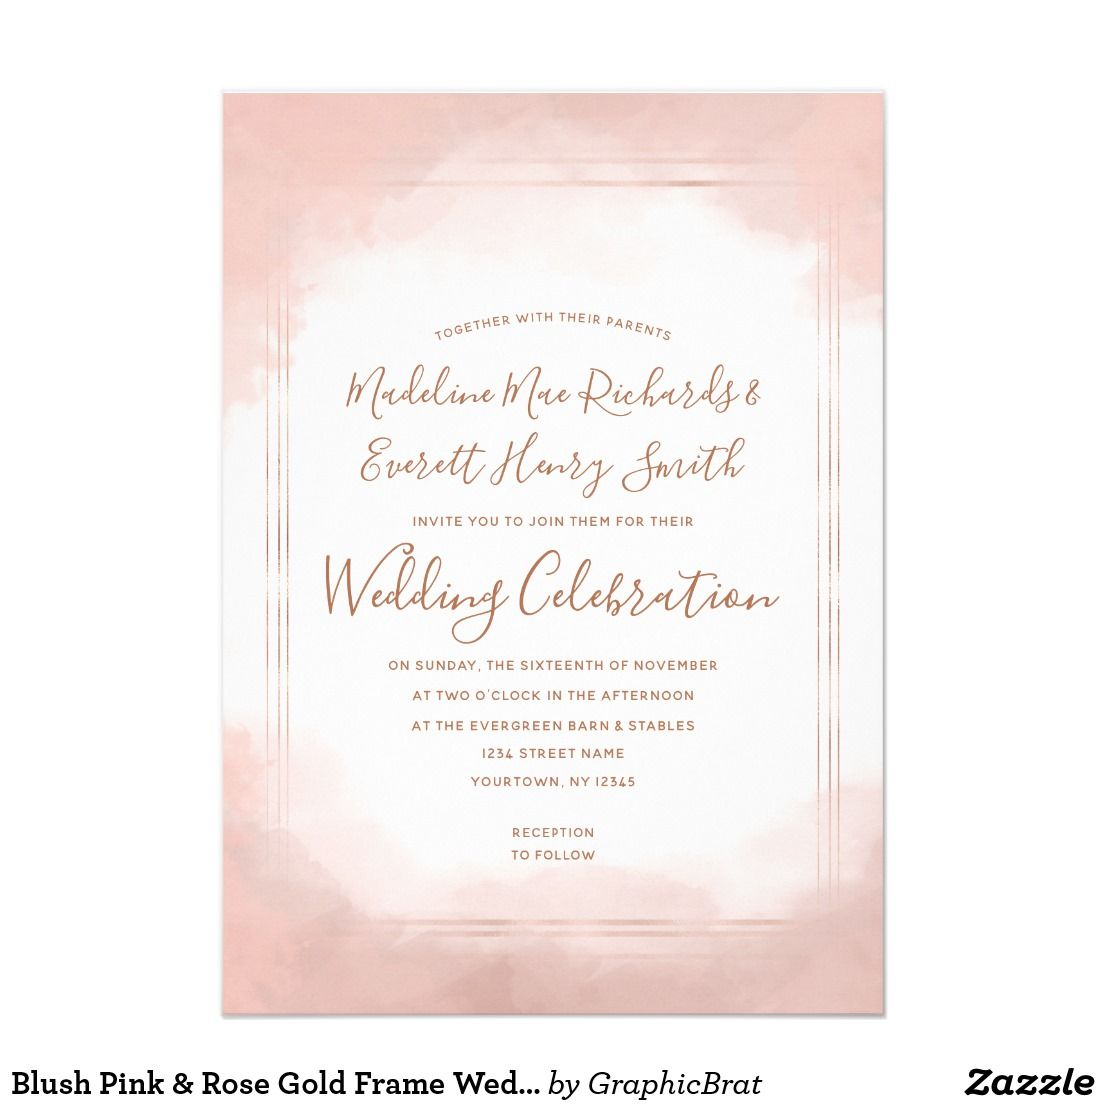 Blush Pink & Rose Gold Frame Wedding Invitation   Wedding & Bridal ...